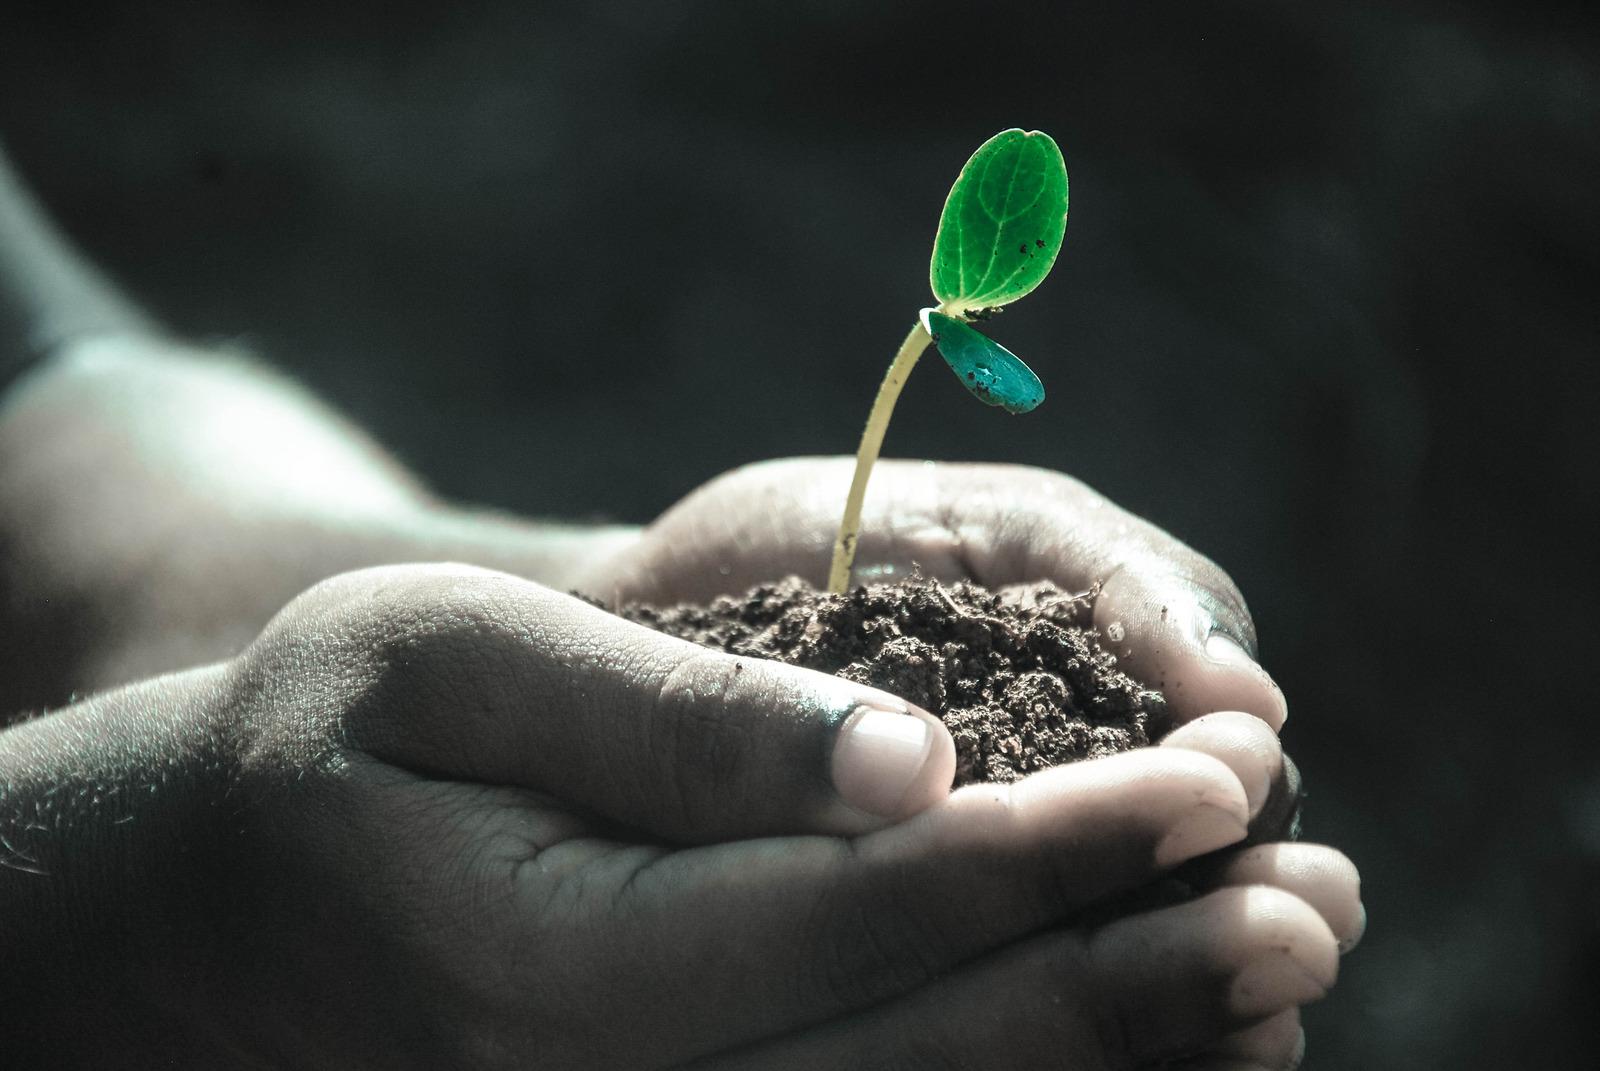 Foto von Pexels--2286921: https://www.canva.com/photos/MADQ4wPYyrY-hands-planting-seedlings/